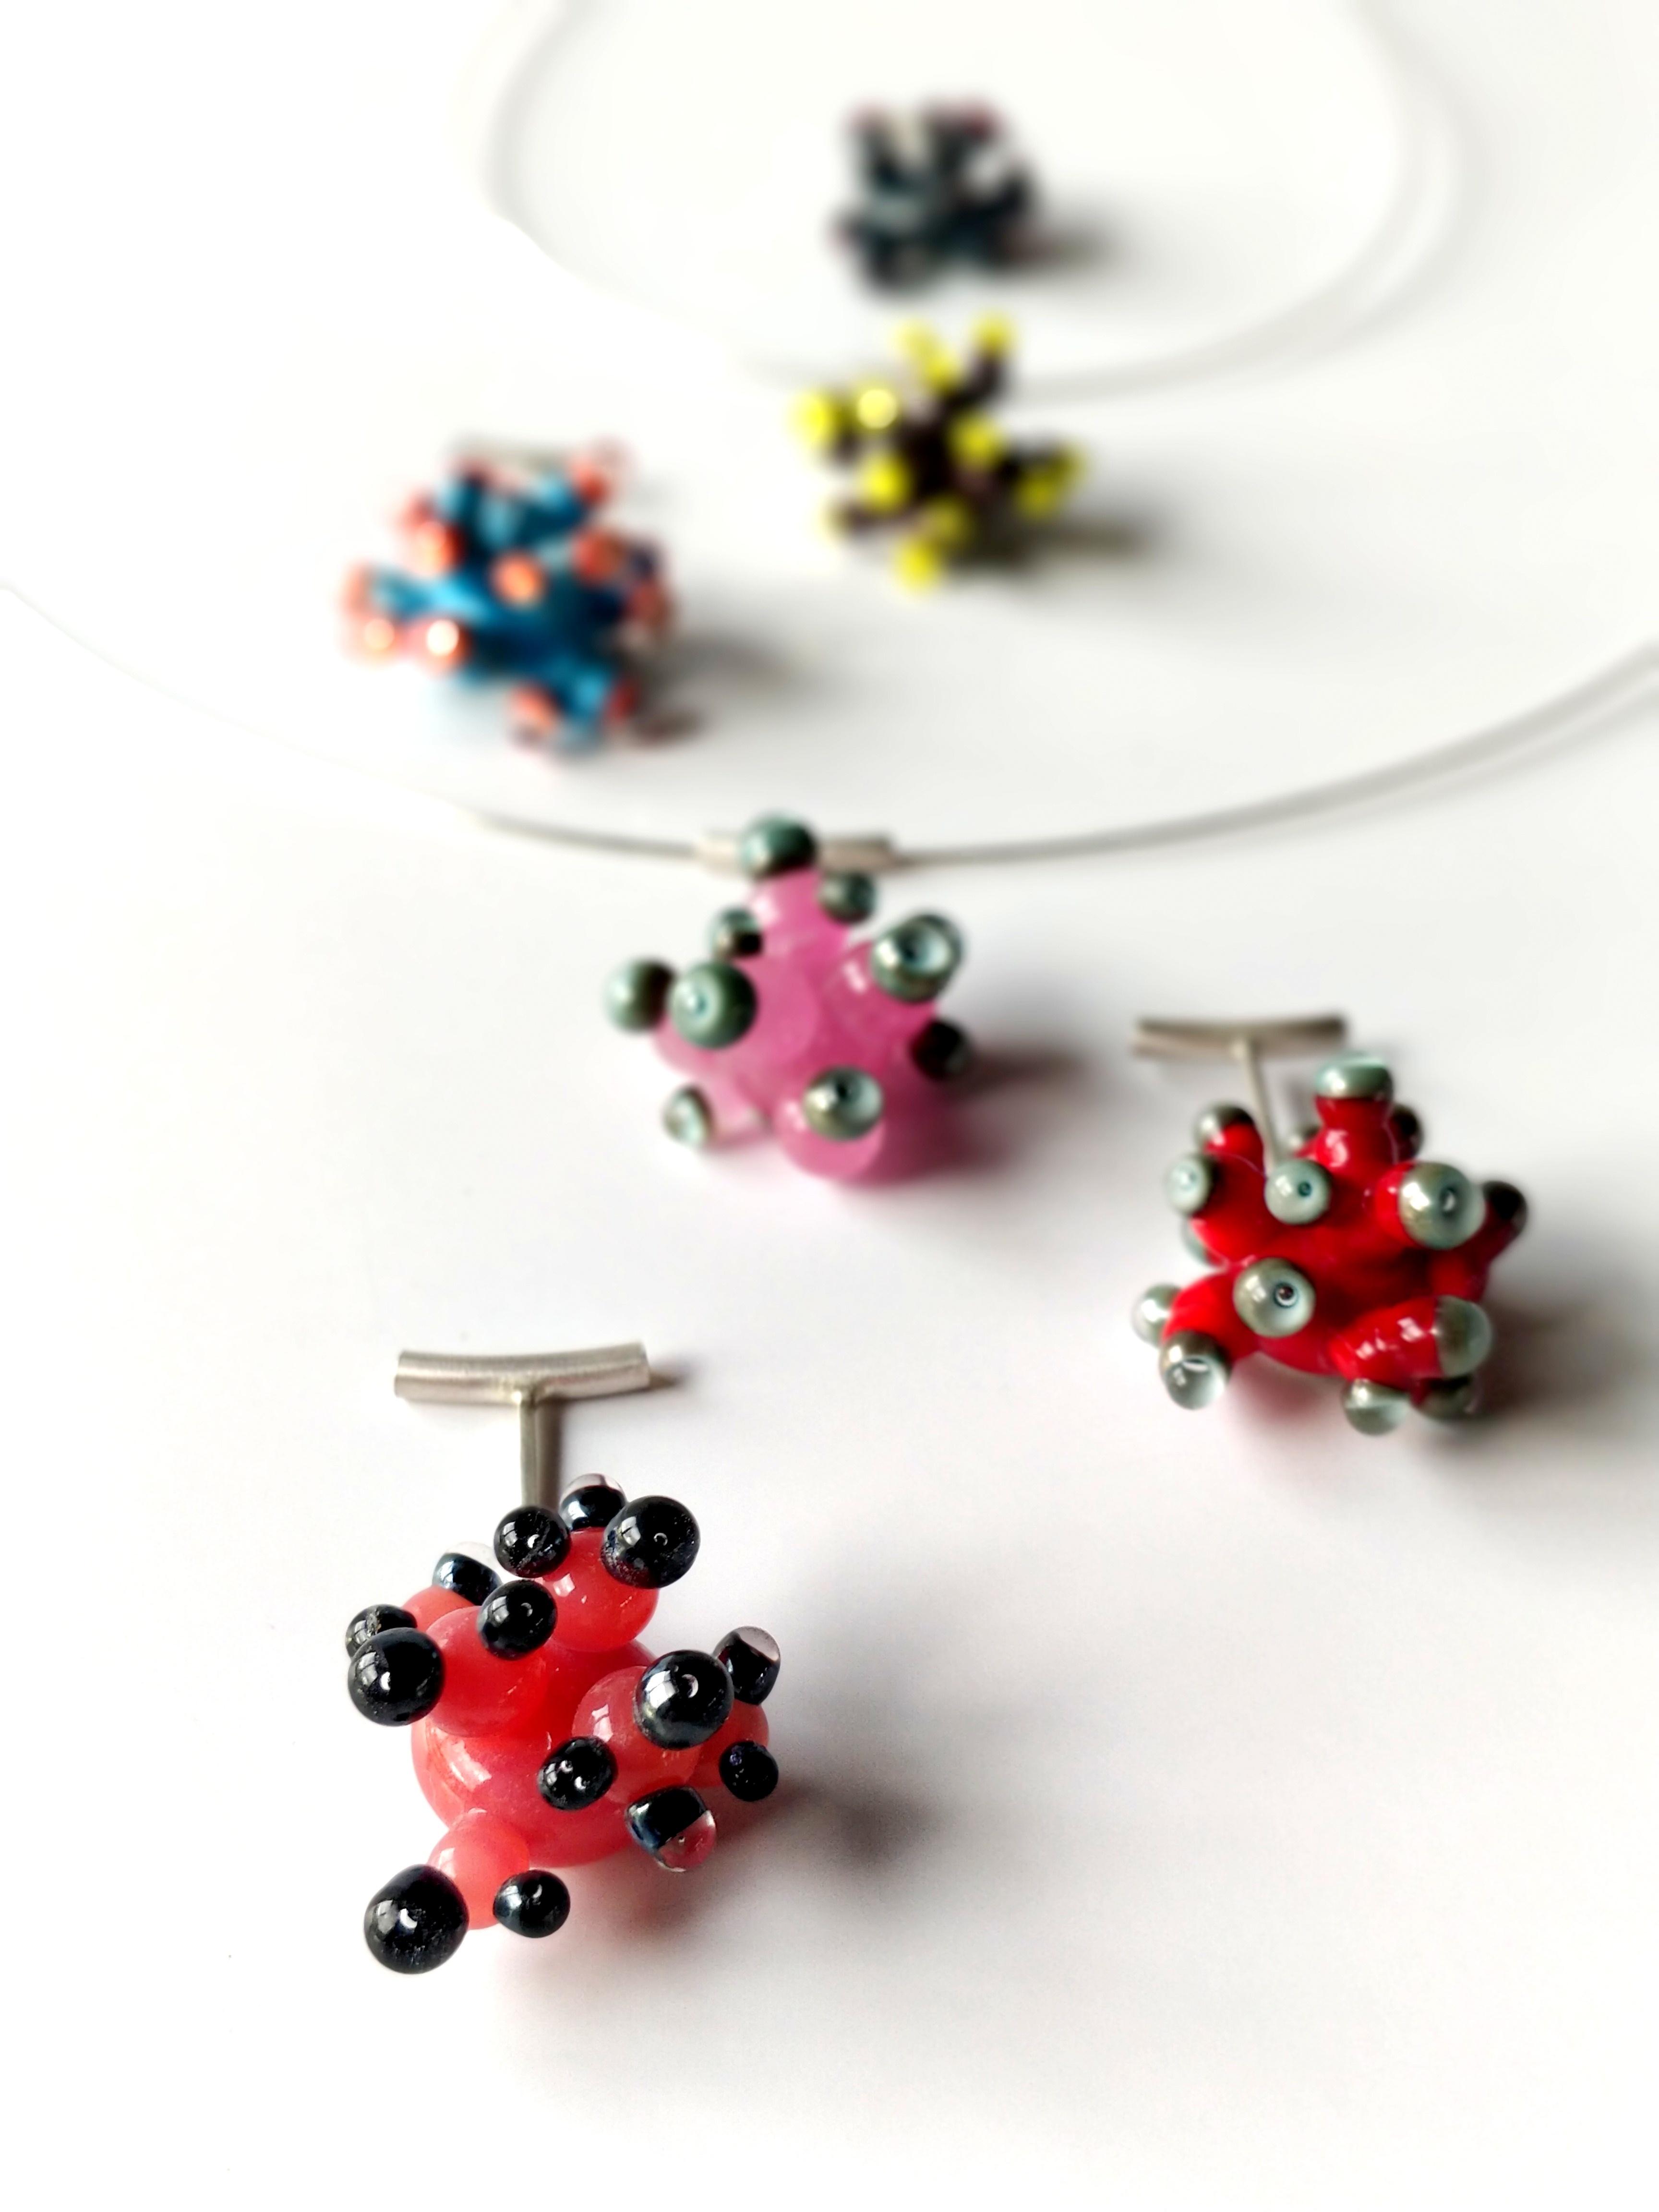 Dark Pink and Black Anemone Pendant Necklace by Cecilia Lopez-Bravo